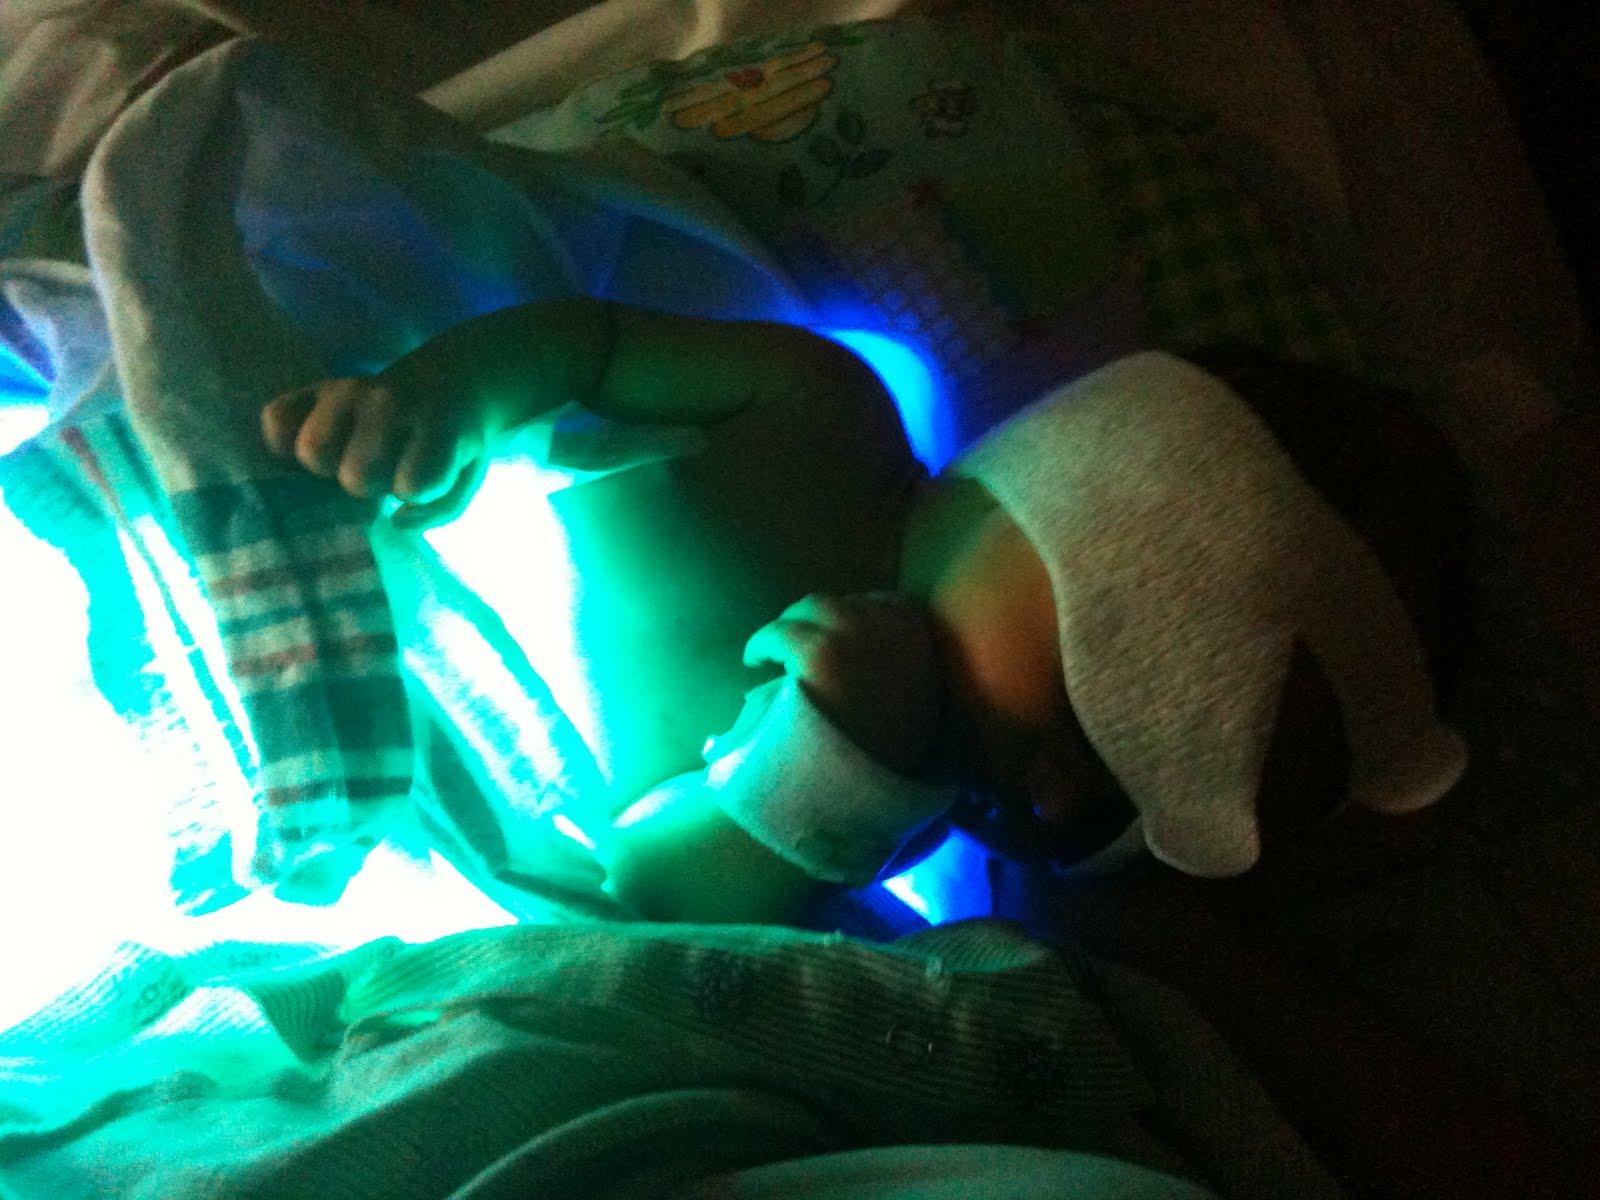 Alejandro, Luis, Mary, and Diego: Glow Worm Alejandro!